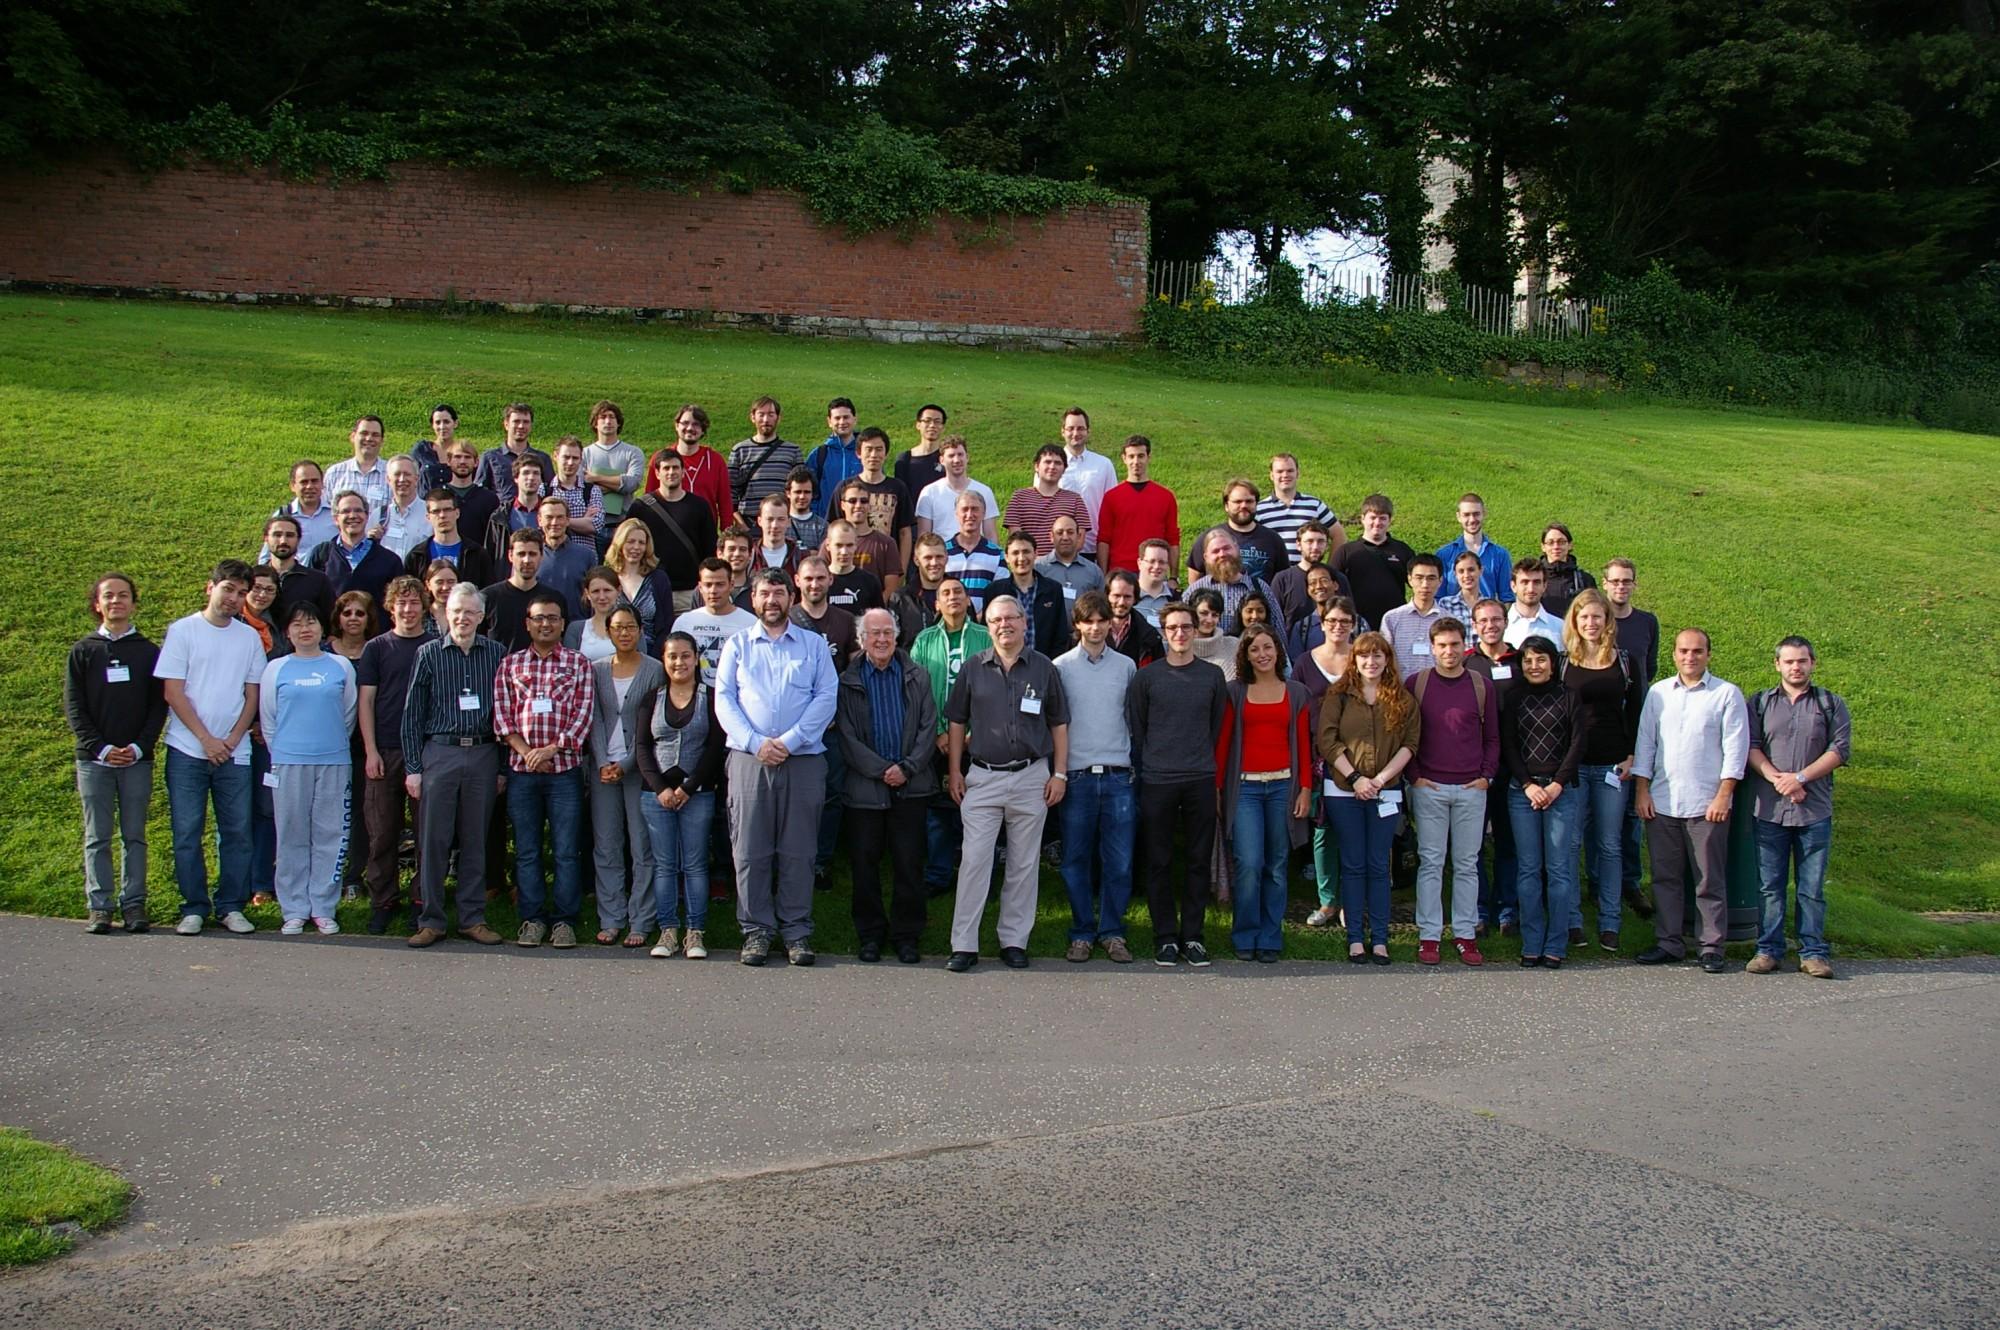 SUSSP69 Group Photograph No. 7 Copyright Alan Walker, University of Edinburgh.